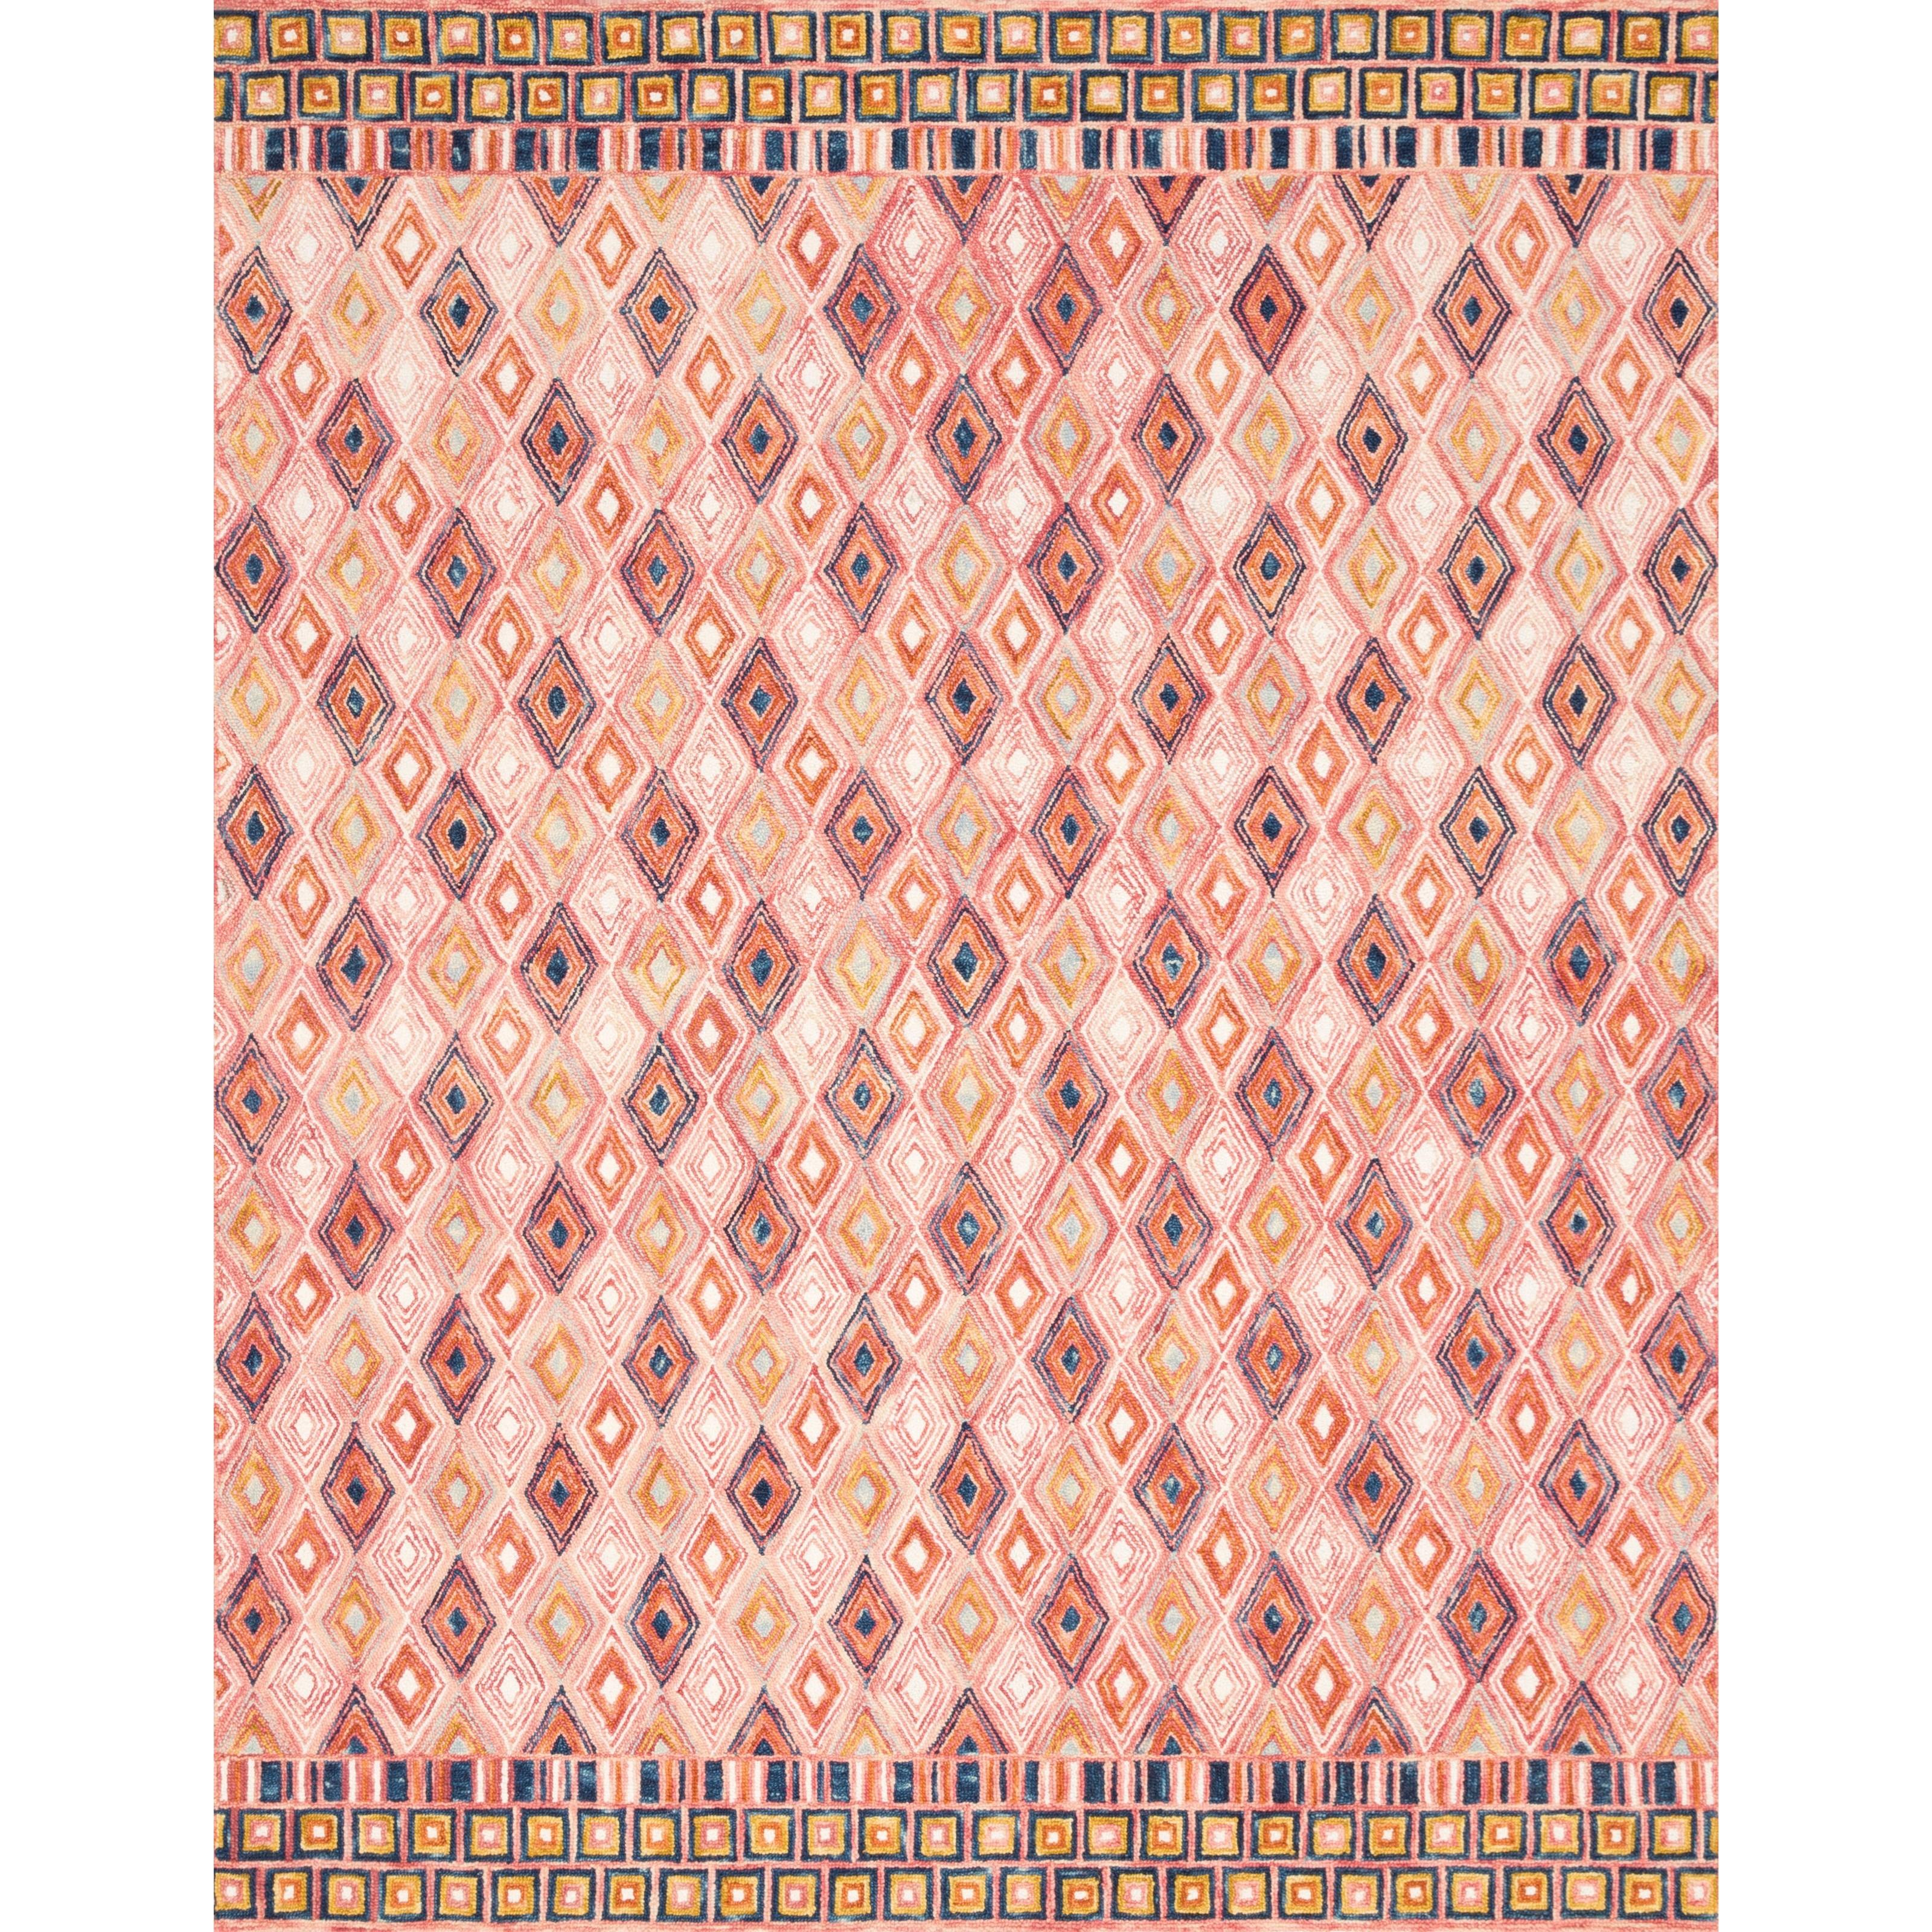 "Priti 9'3"" x 13' Pink / Sunset Rug by Loloi Rugs at Virginia Furniture Market"